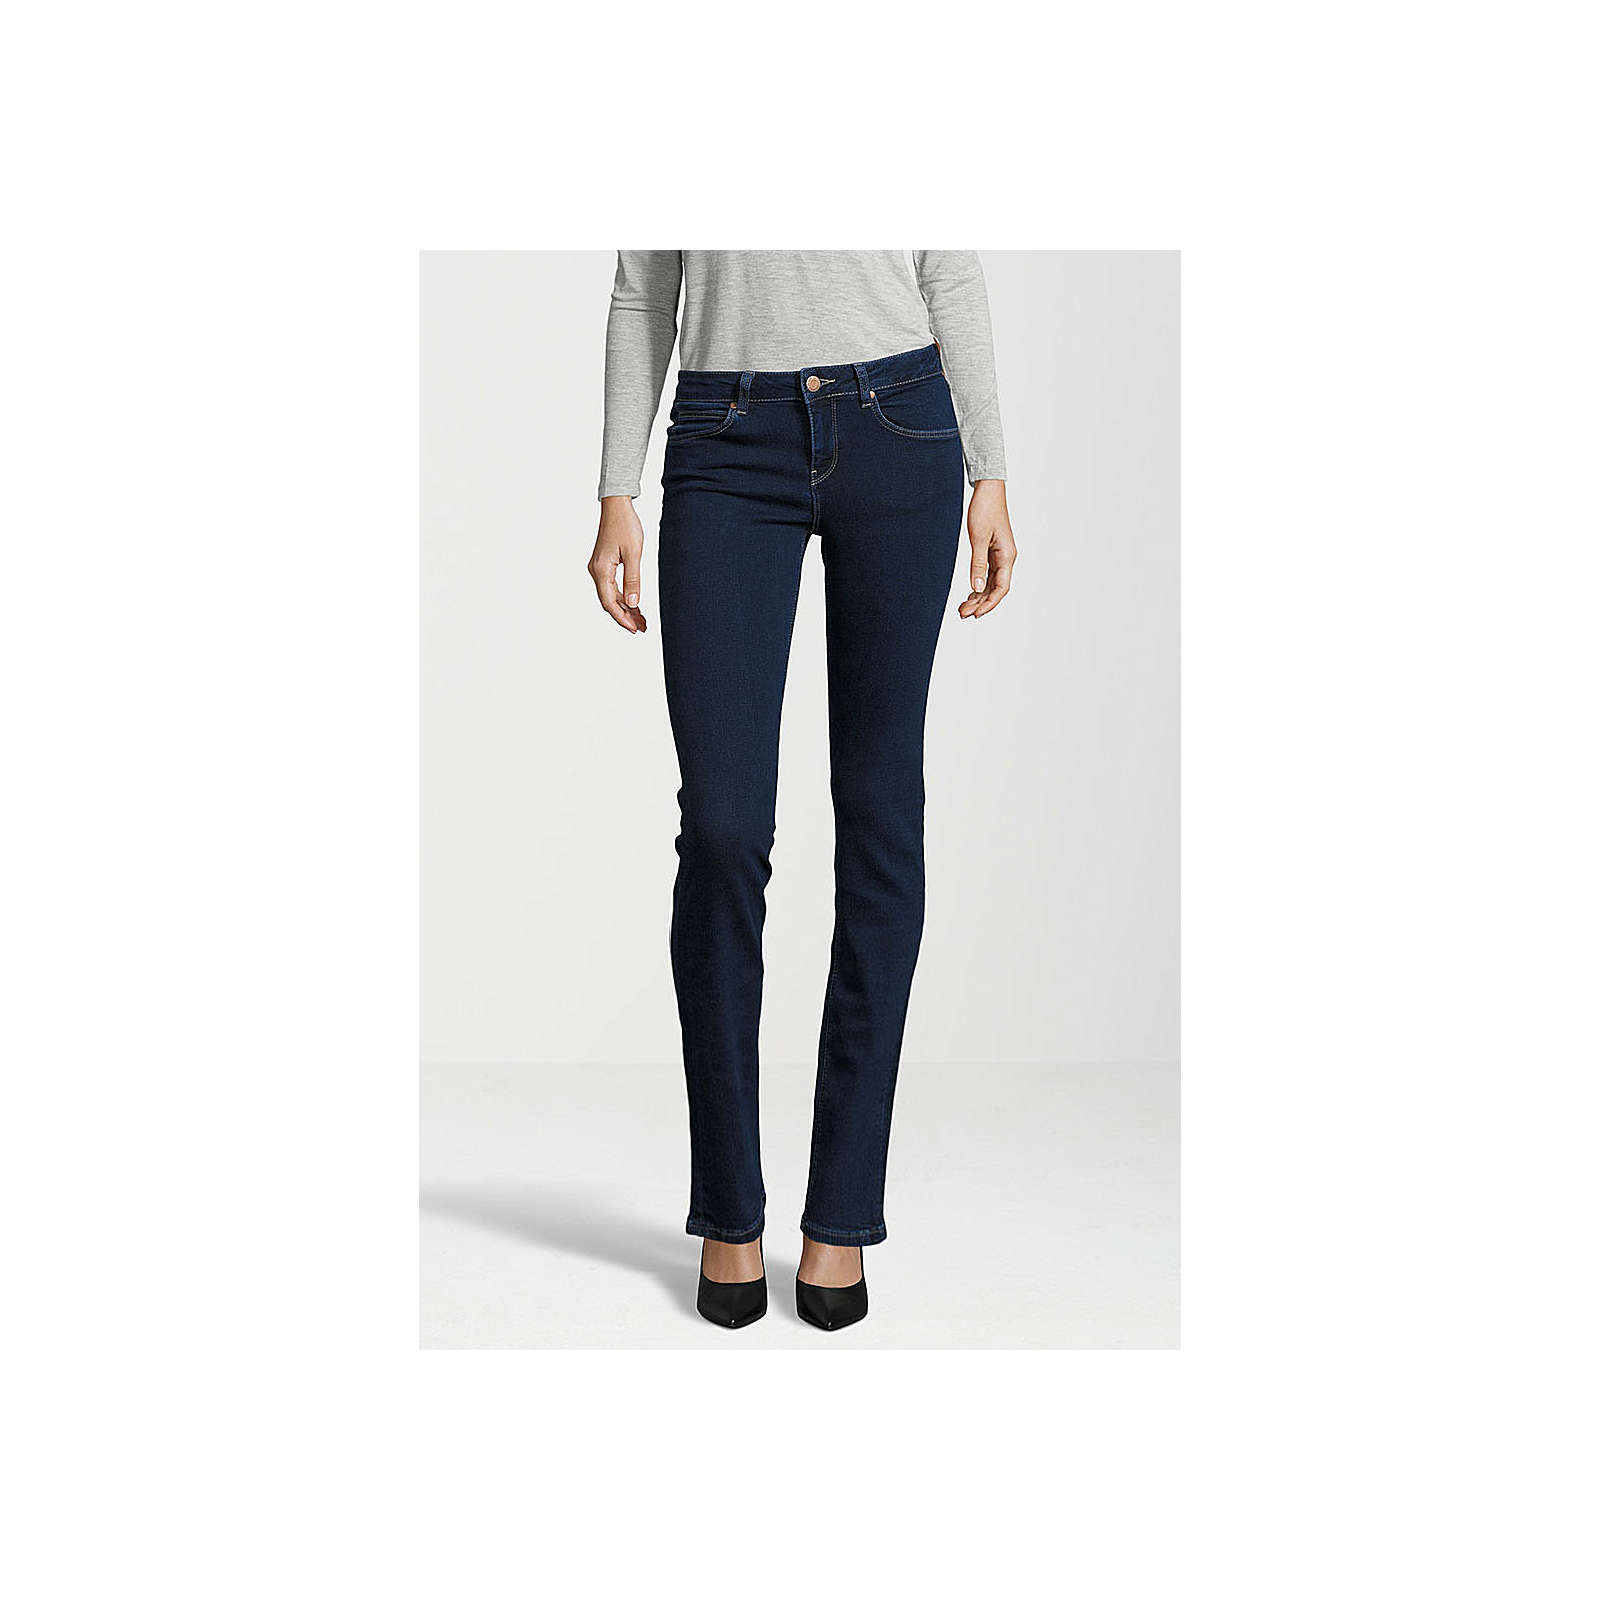 Gin Tonic Jeans STRAIGHT plain dark Jeanshosen dunkelblau Damen Gr. W26/L32